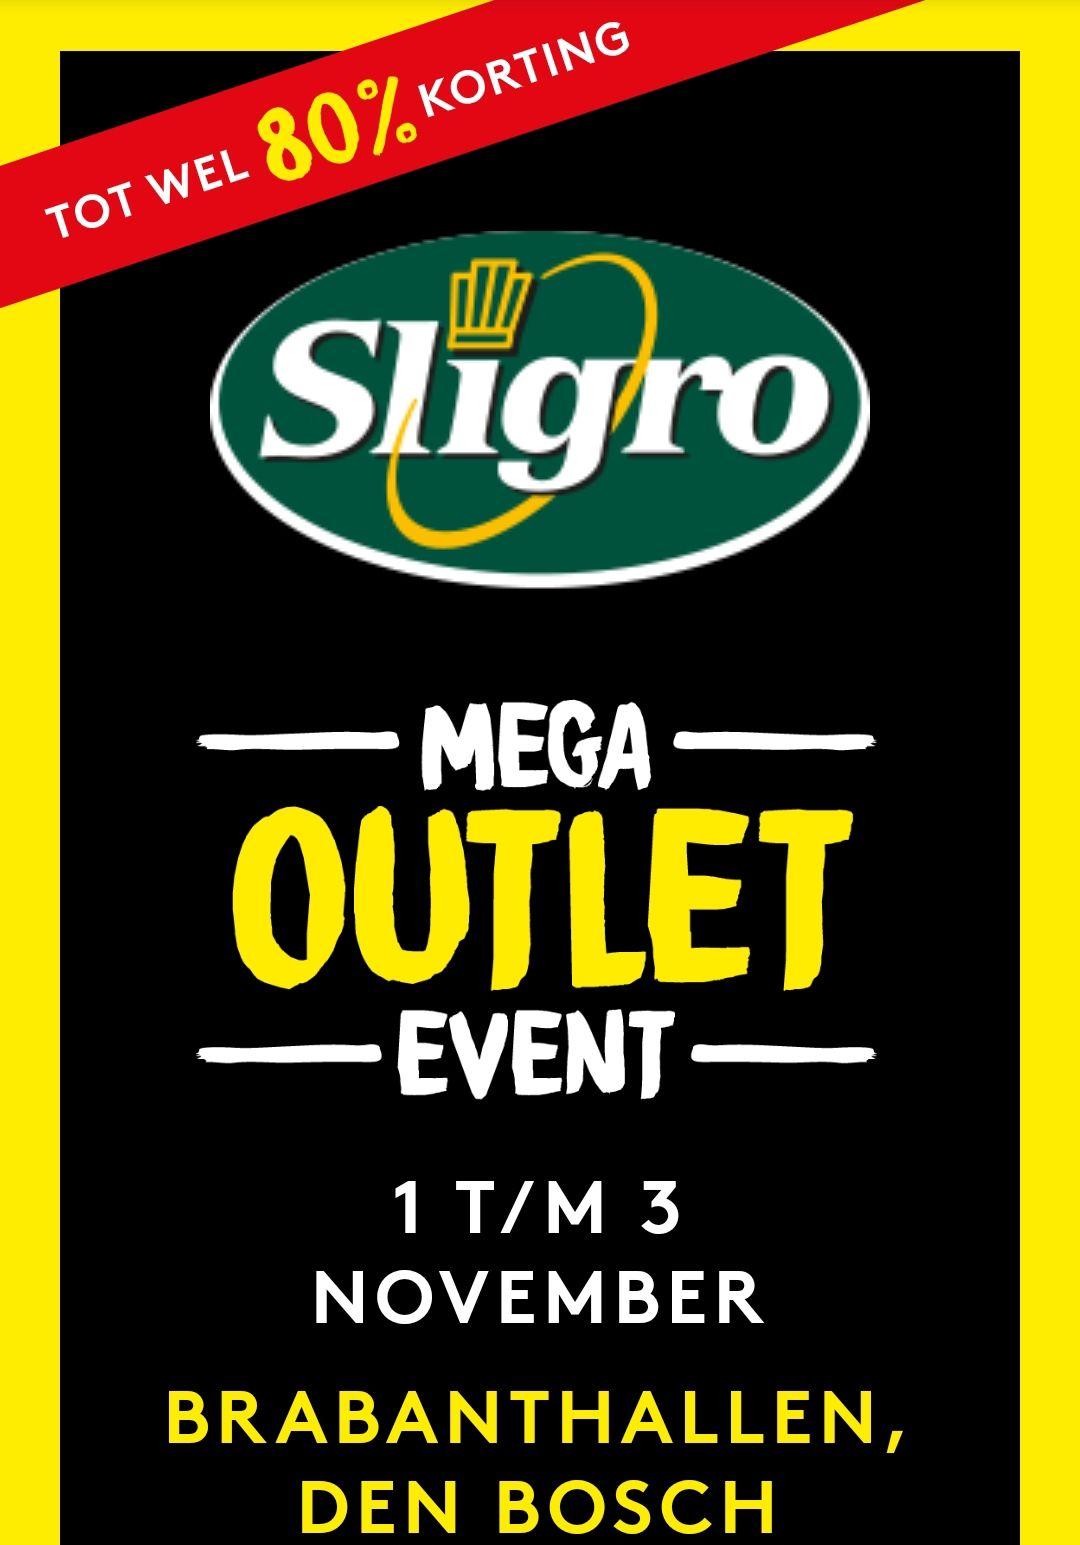 (Lokaal Den Bosch) Sligro mega outlet event tot wel 80% korting geen Sligro pas nodig